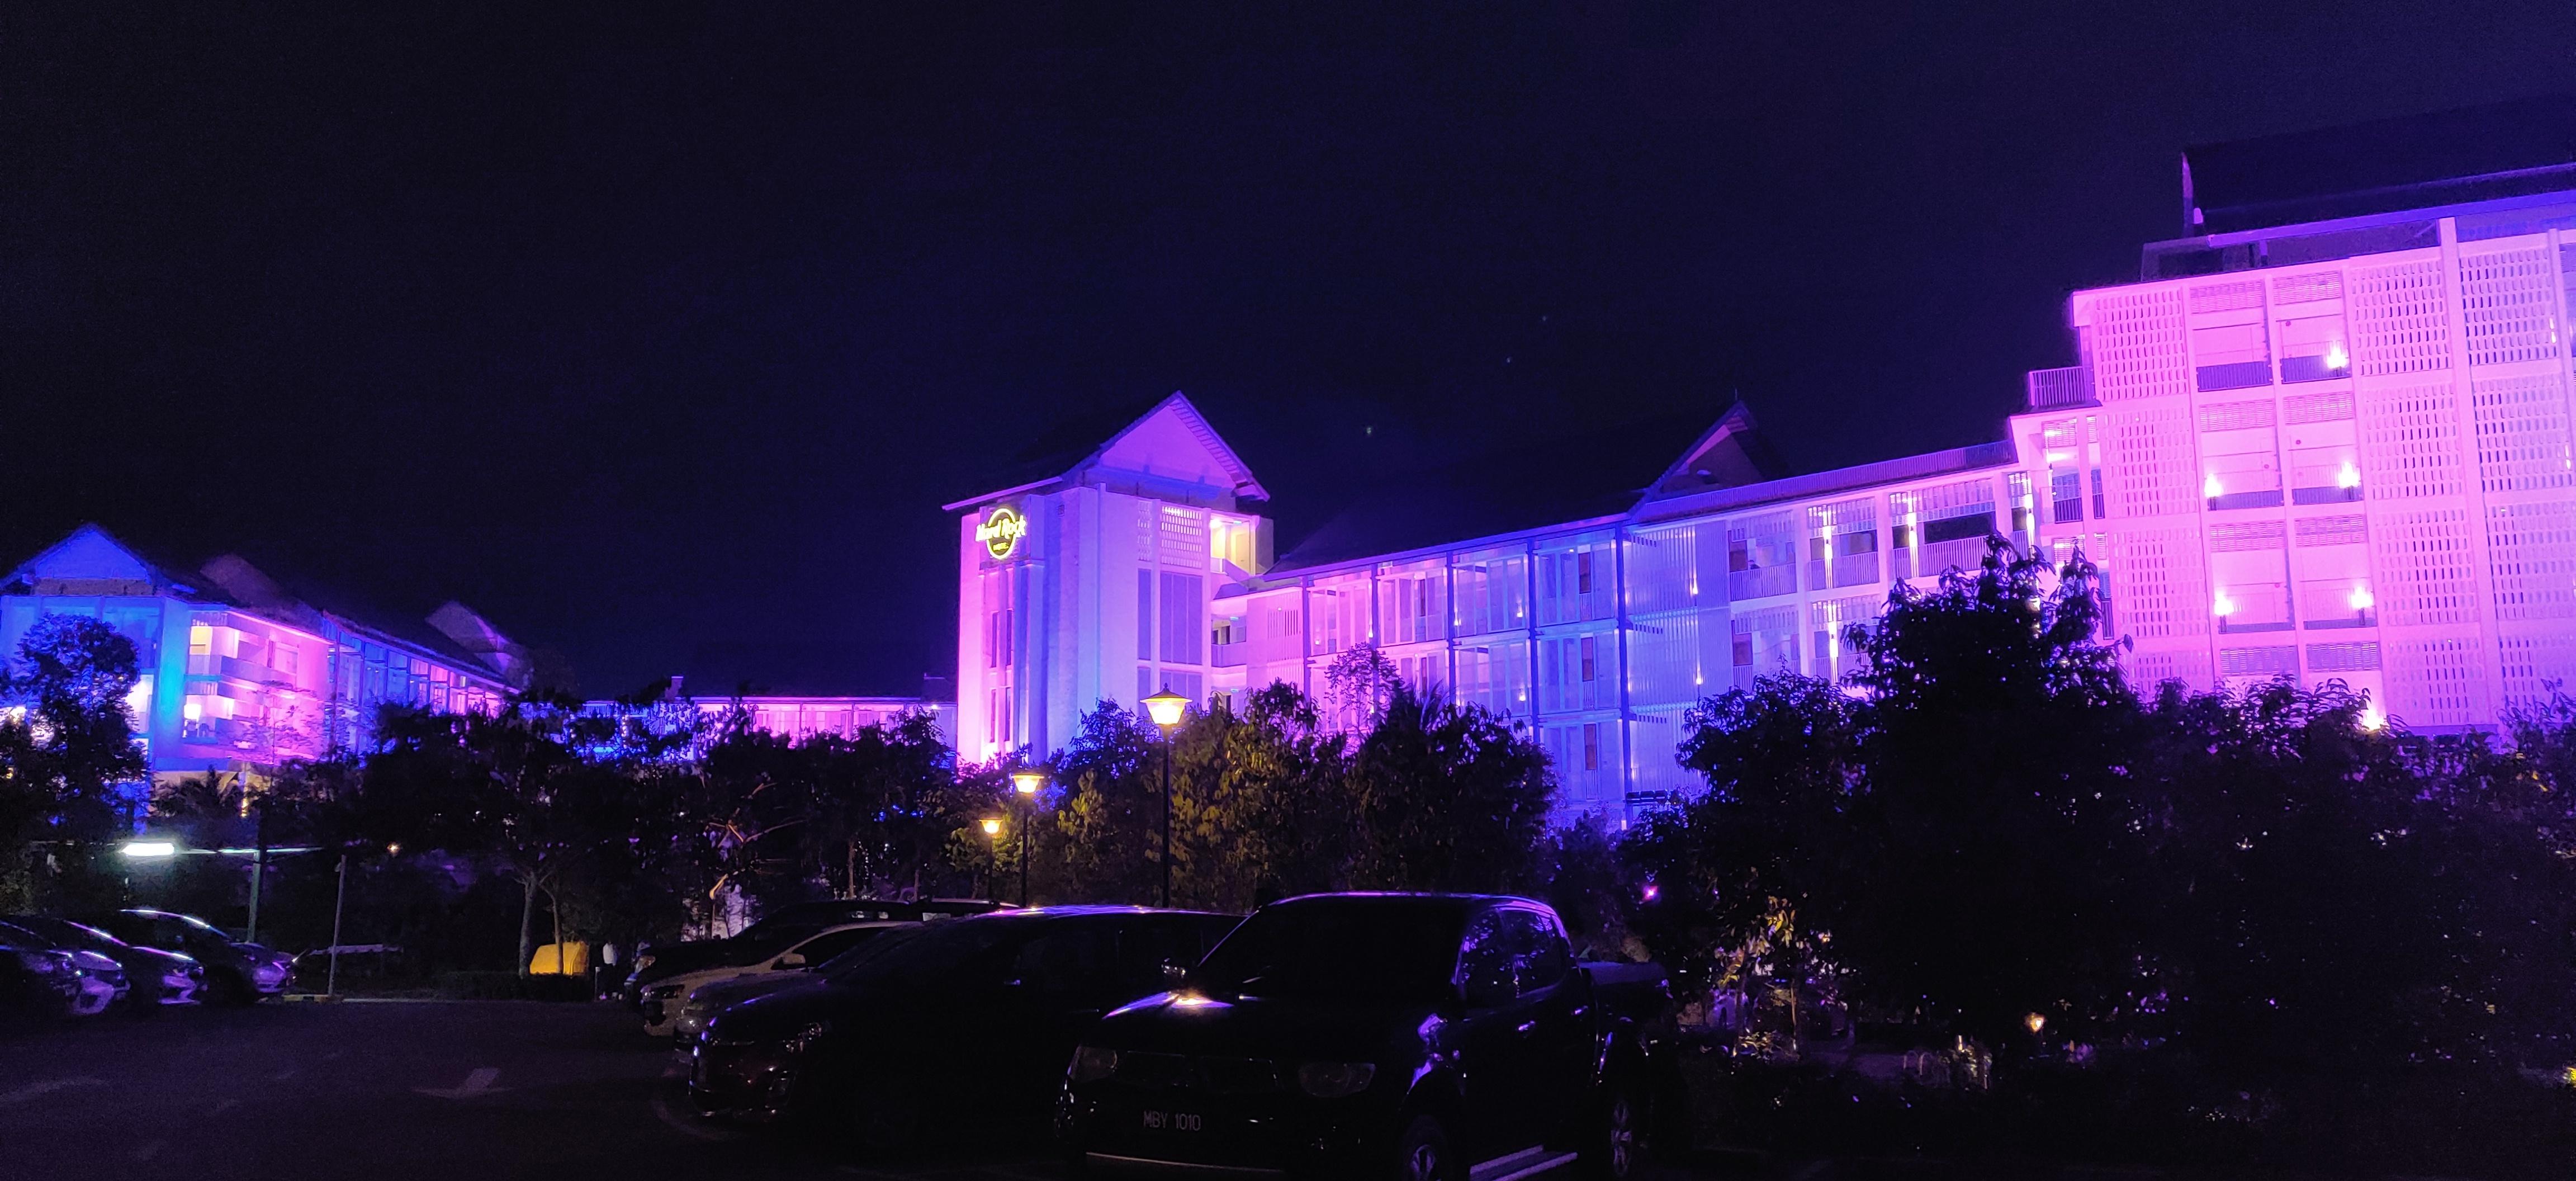 Lighting for Hard Rock Hotel Desaru Coast in Malaysia